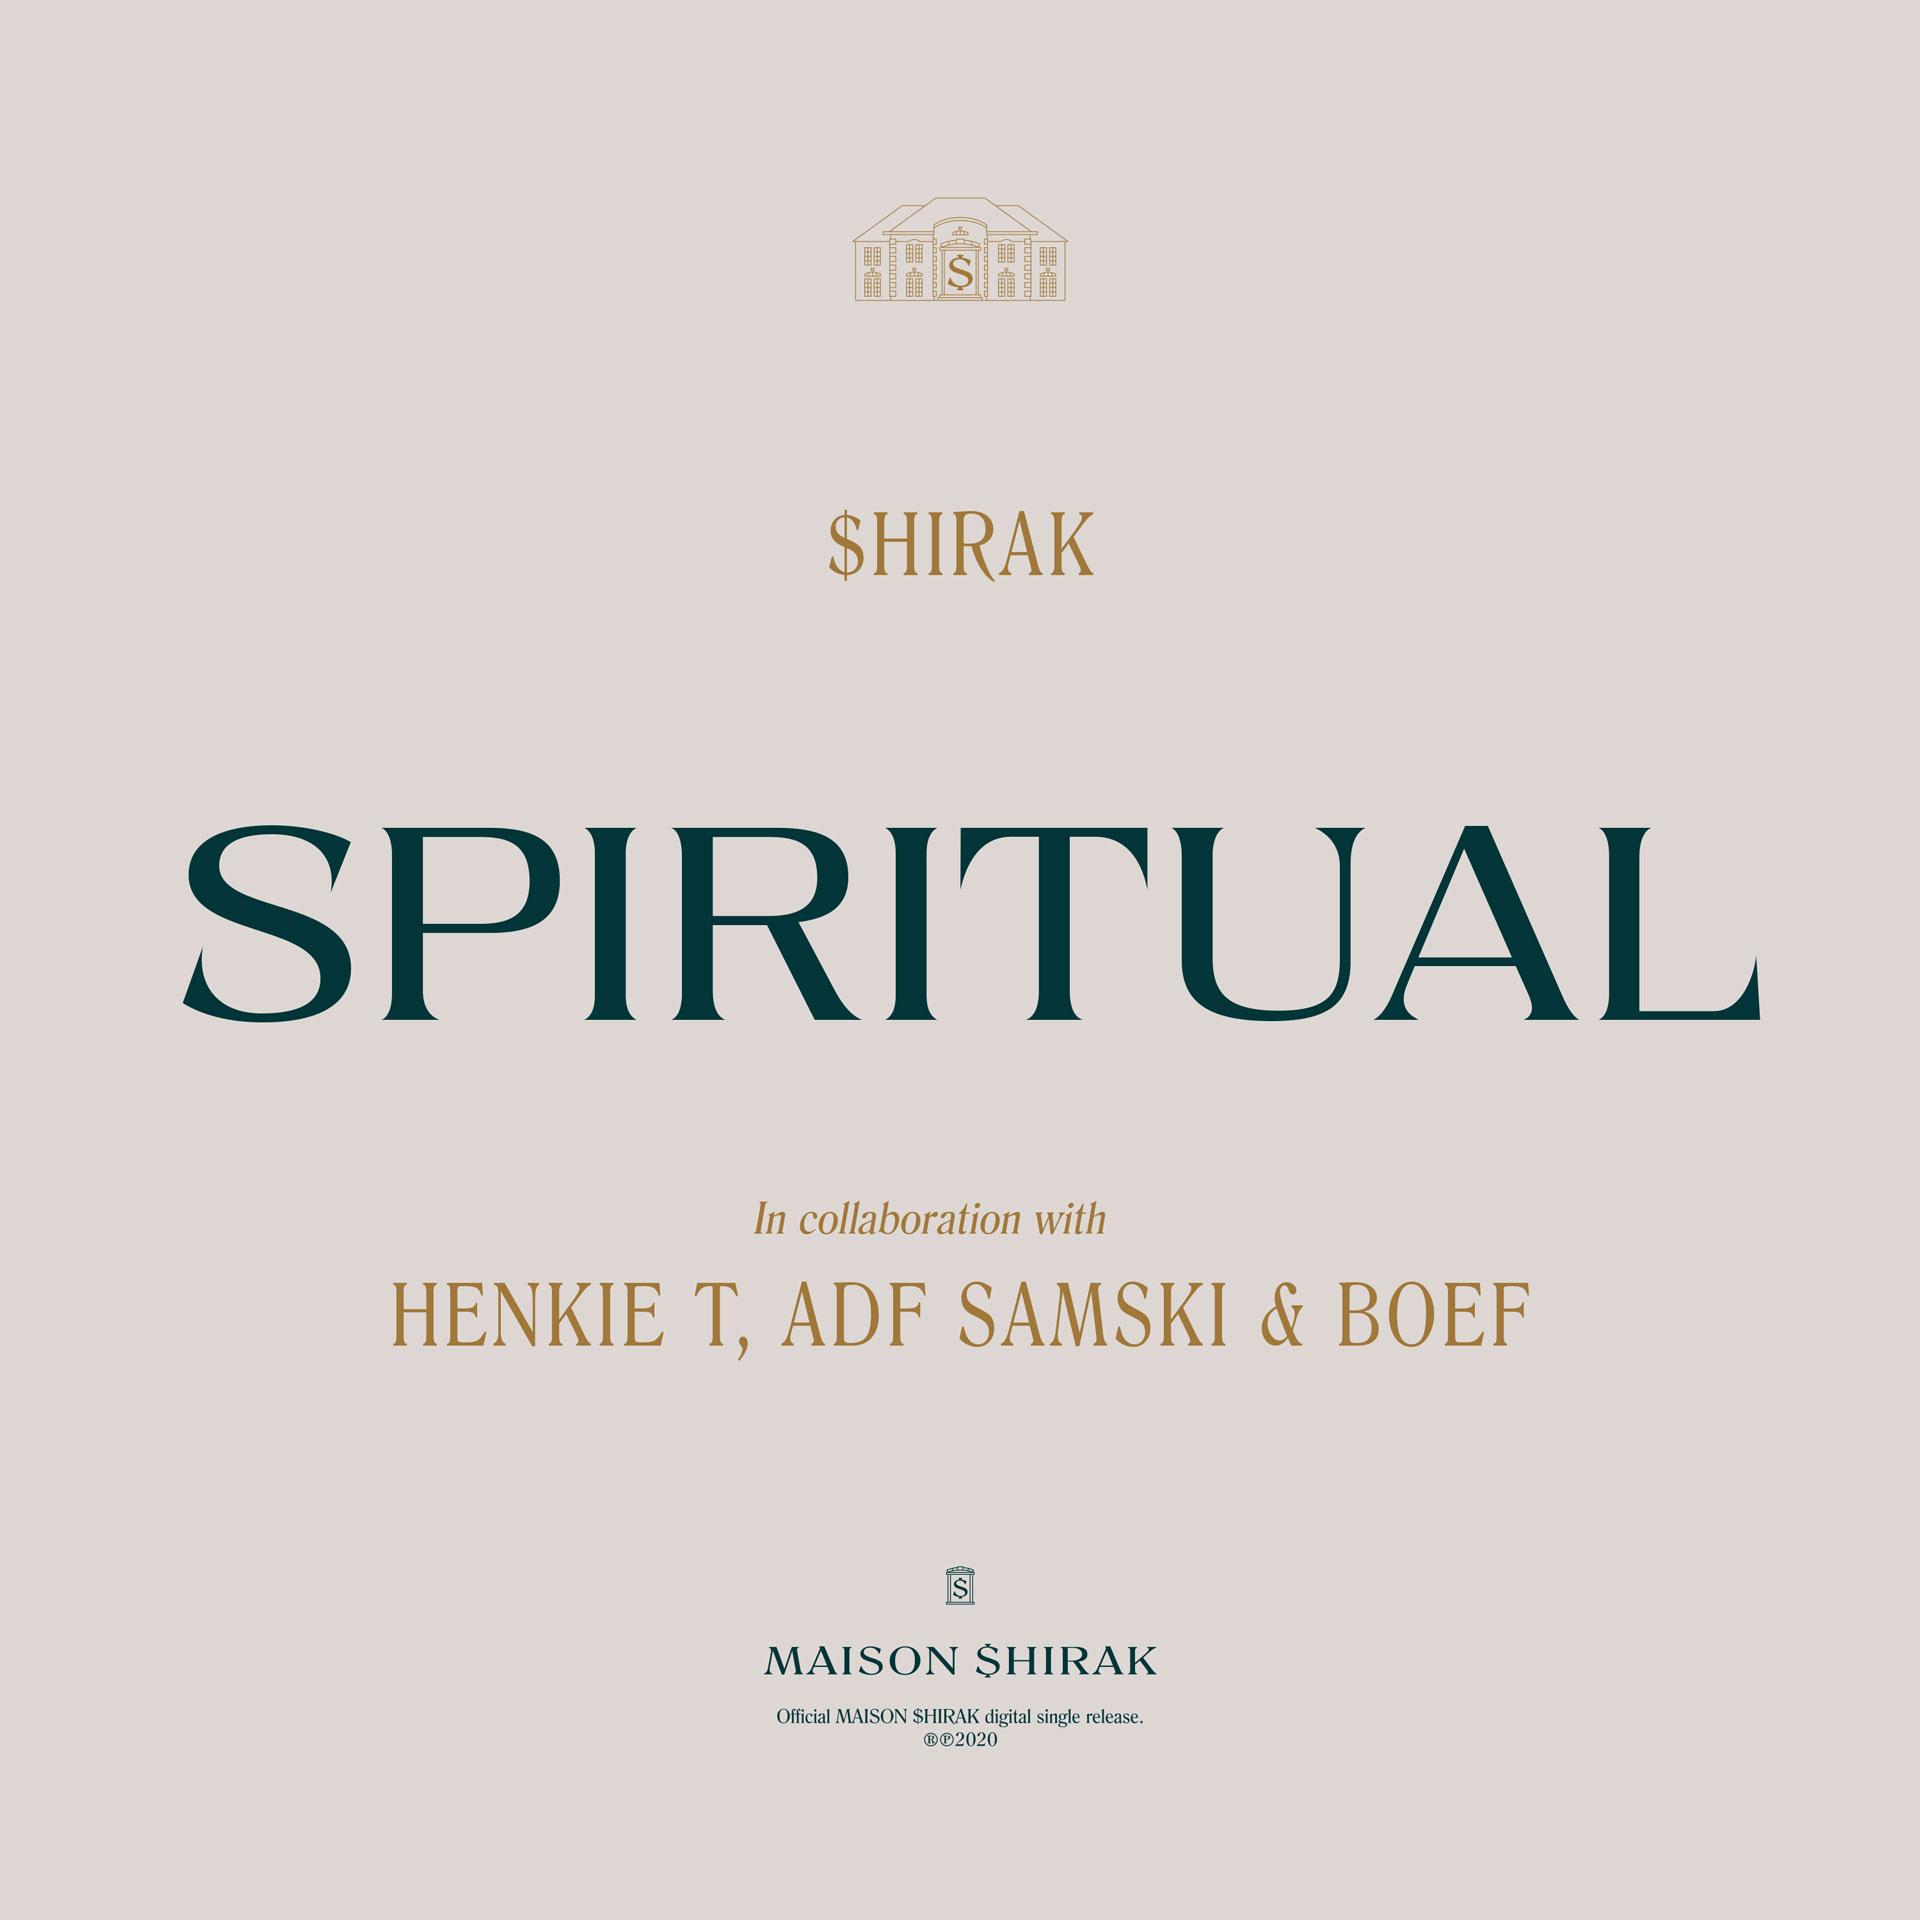 $hirak ft. Henkie T, ADF Samski & Boef – Spiritual